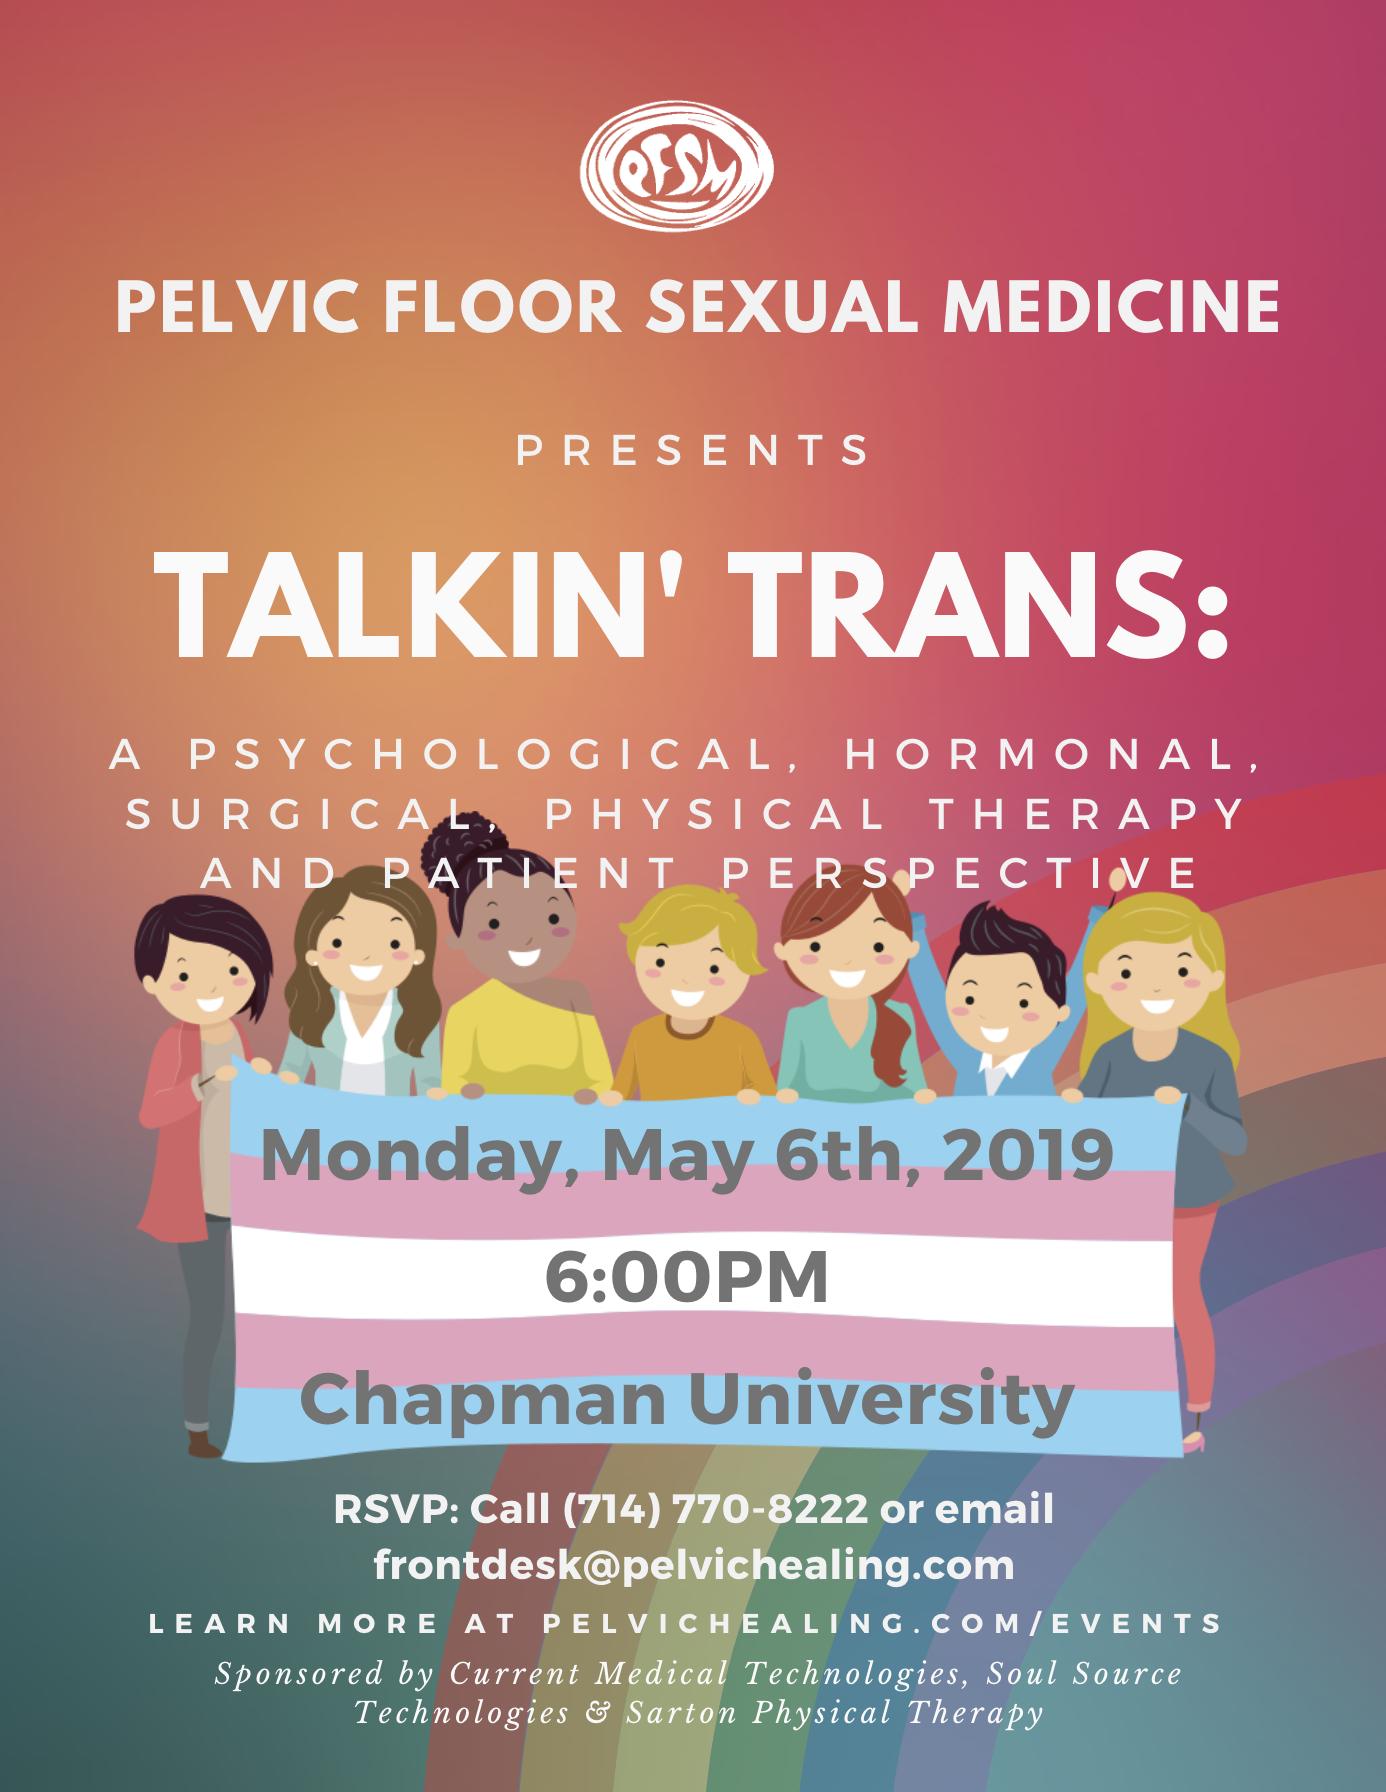 Pelvic Floor Sexual Medicine 2019